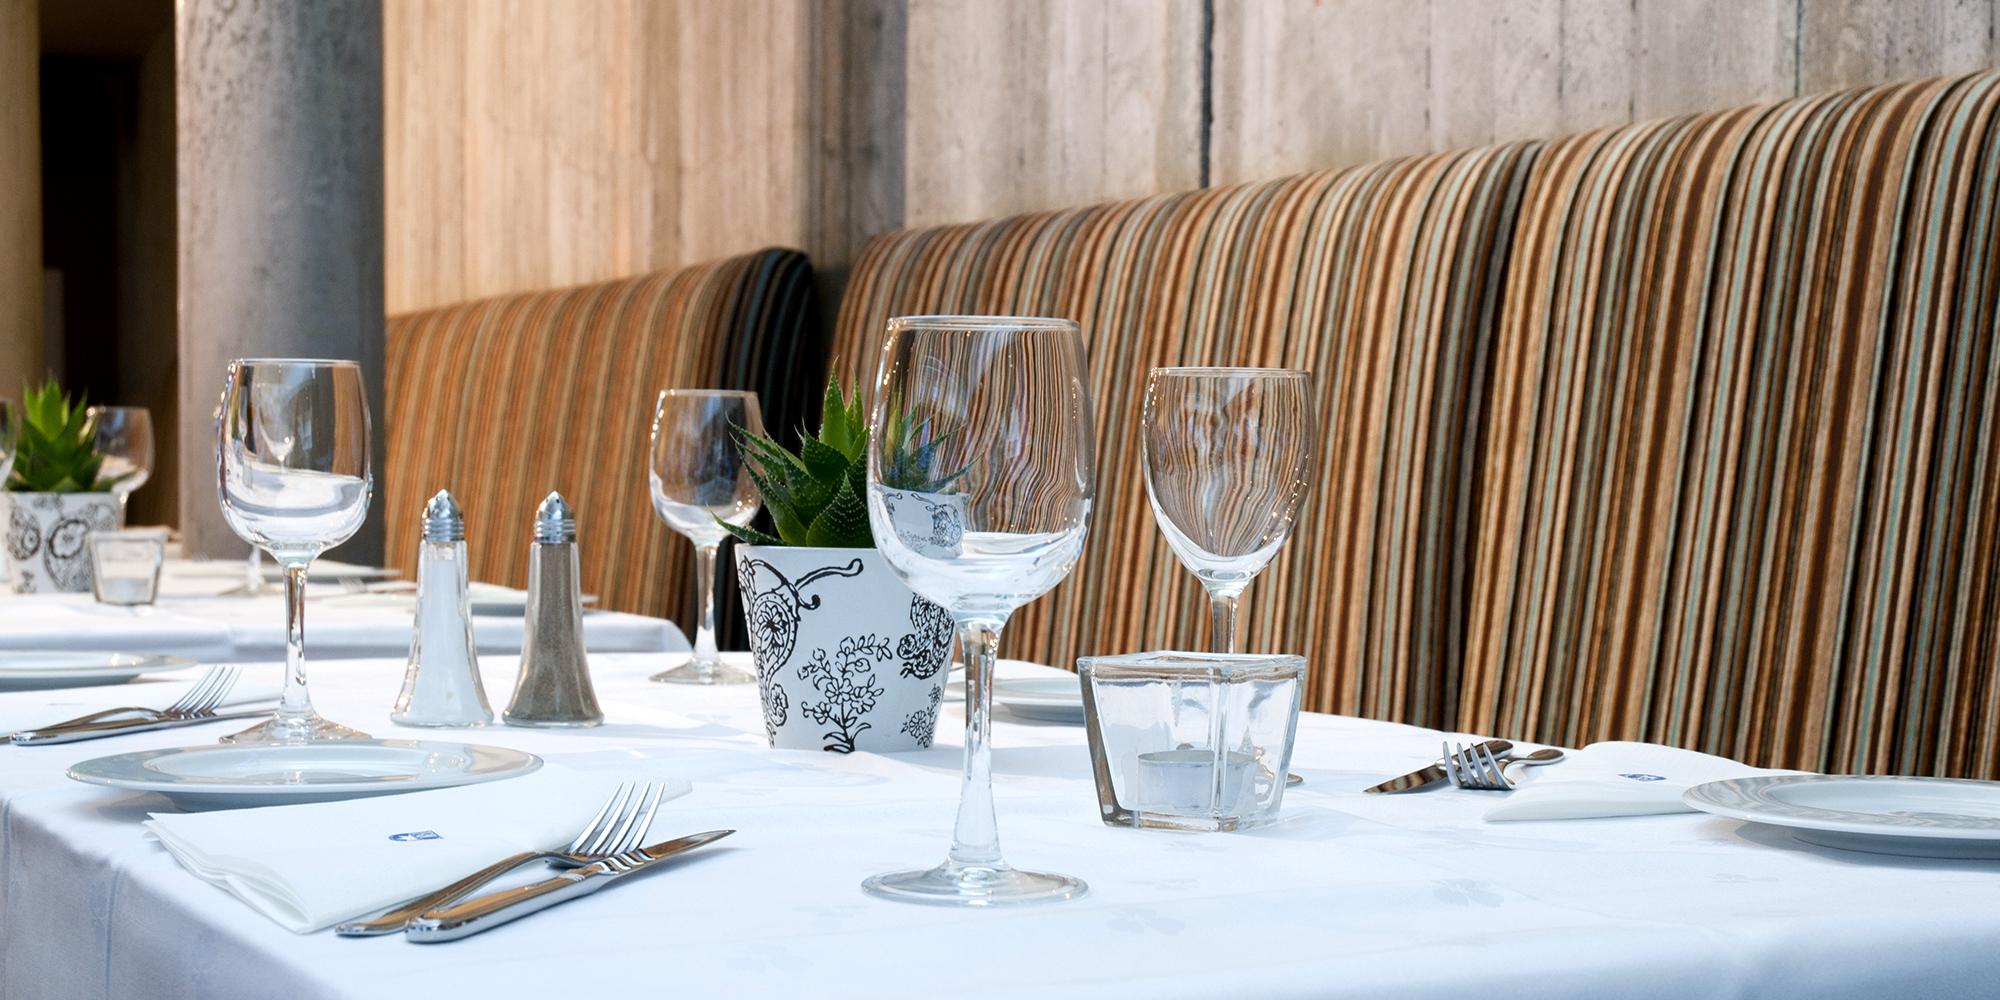 Restaurant Skalden at Stiklestad Hotell. Copyright: Stiklestad